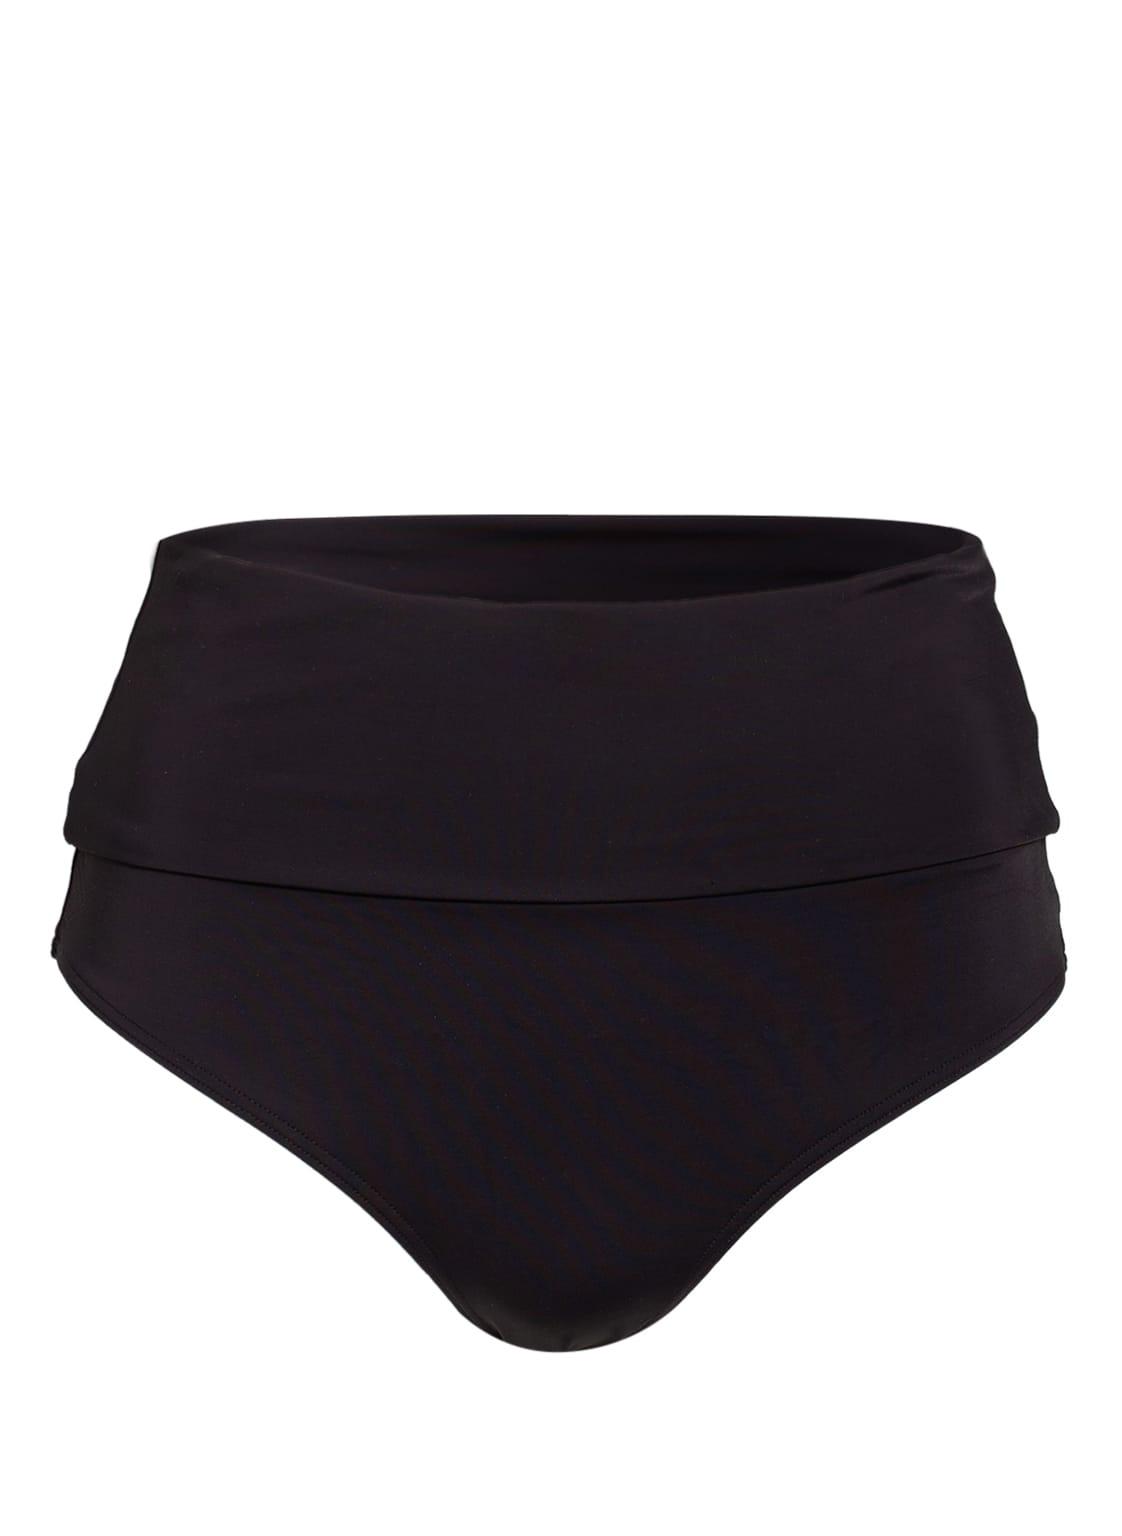 Image of Aubade Bikini-Hose La Plage Ensoleil schwarz